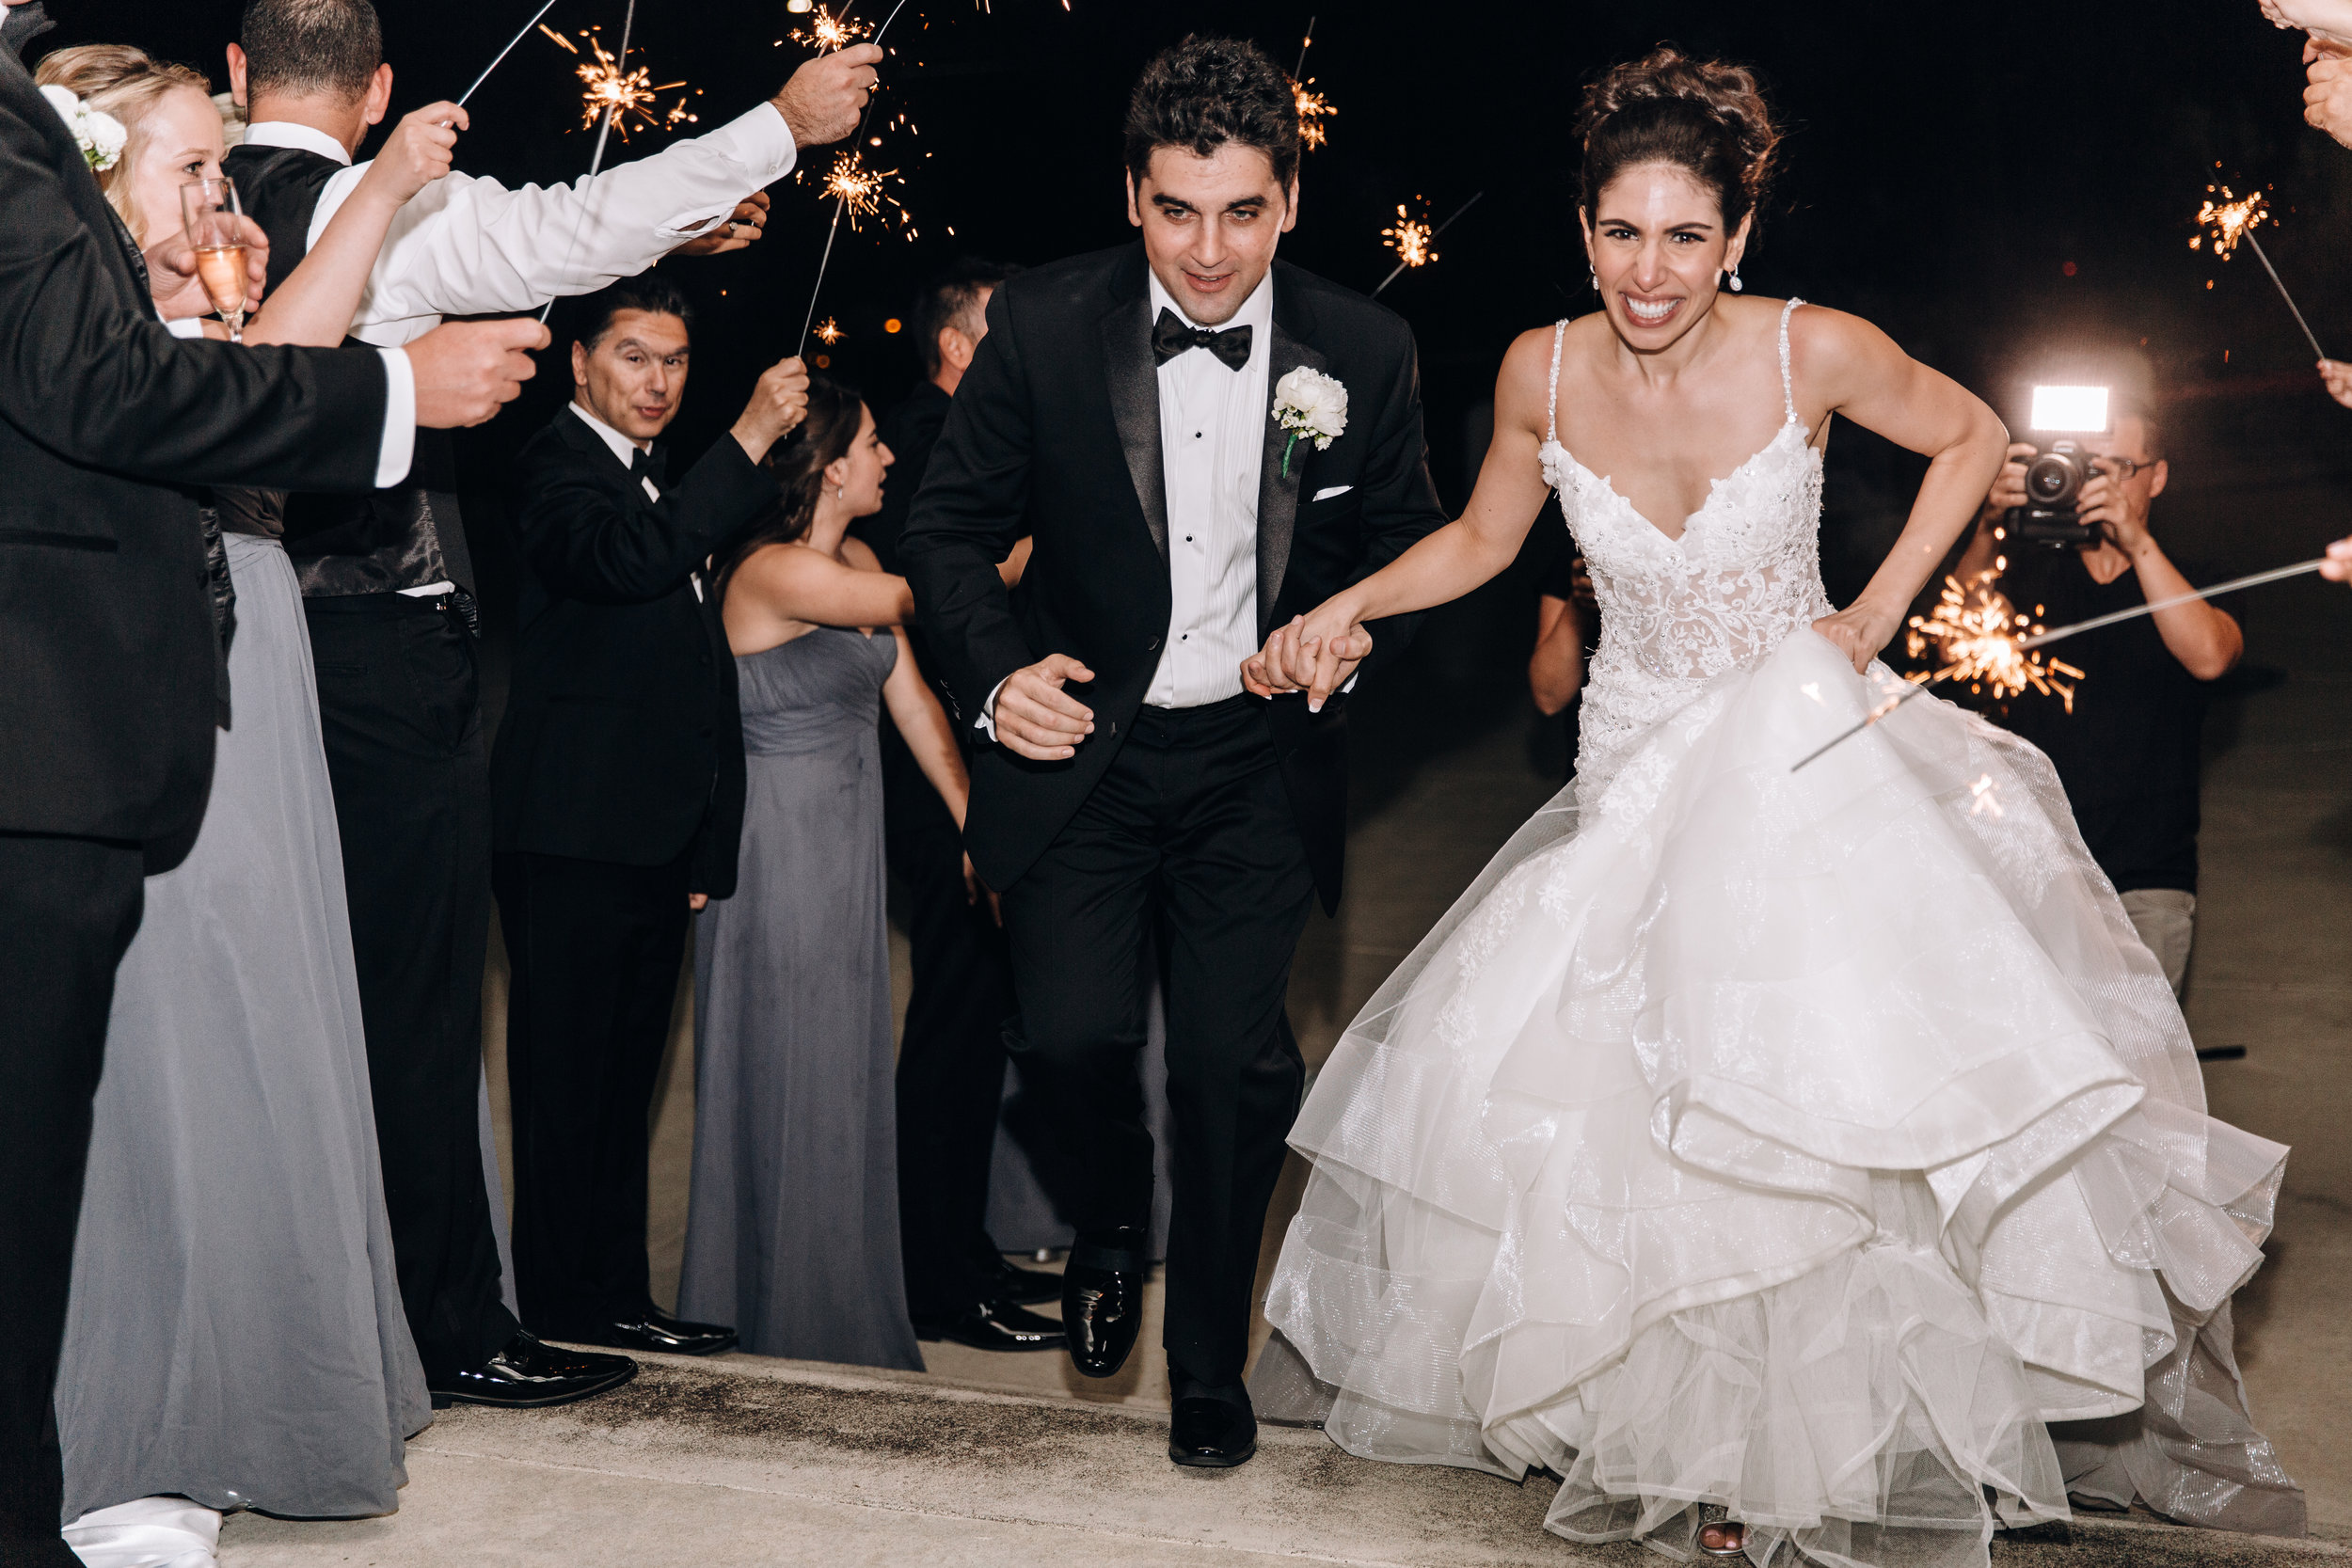 KaraNixonWeddings-GreekOrthodox-Oakland-Wedding-61.jpg